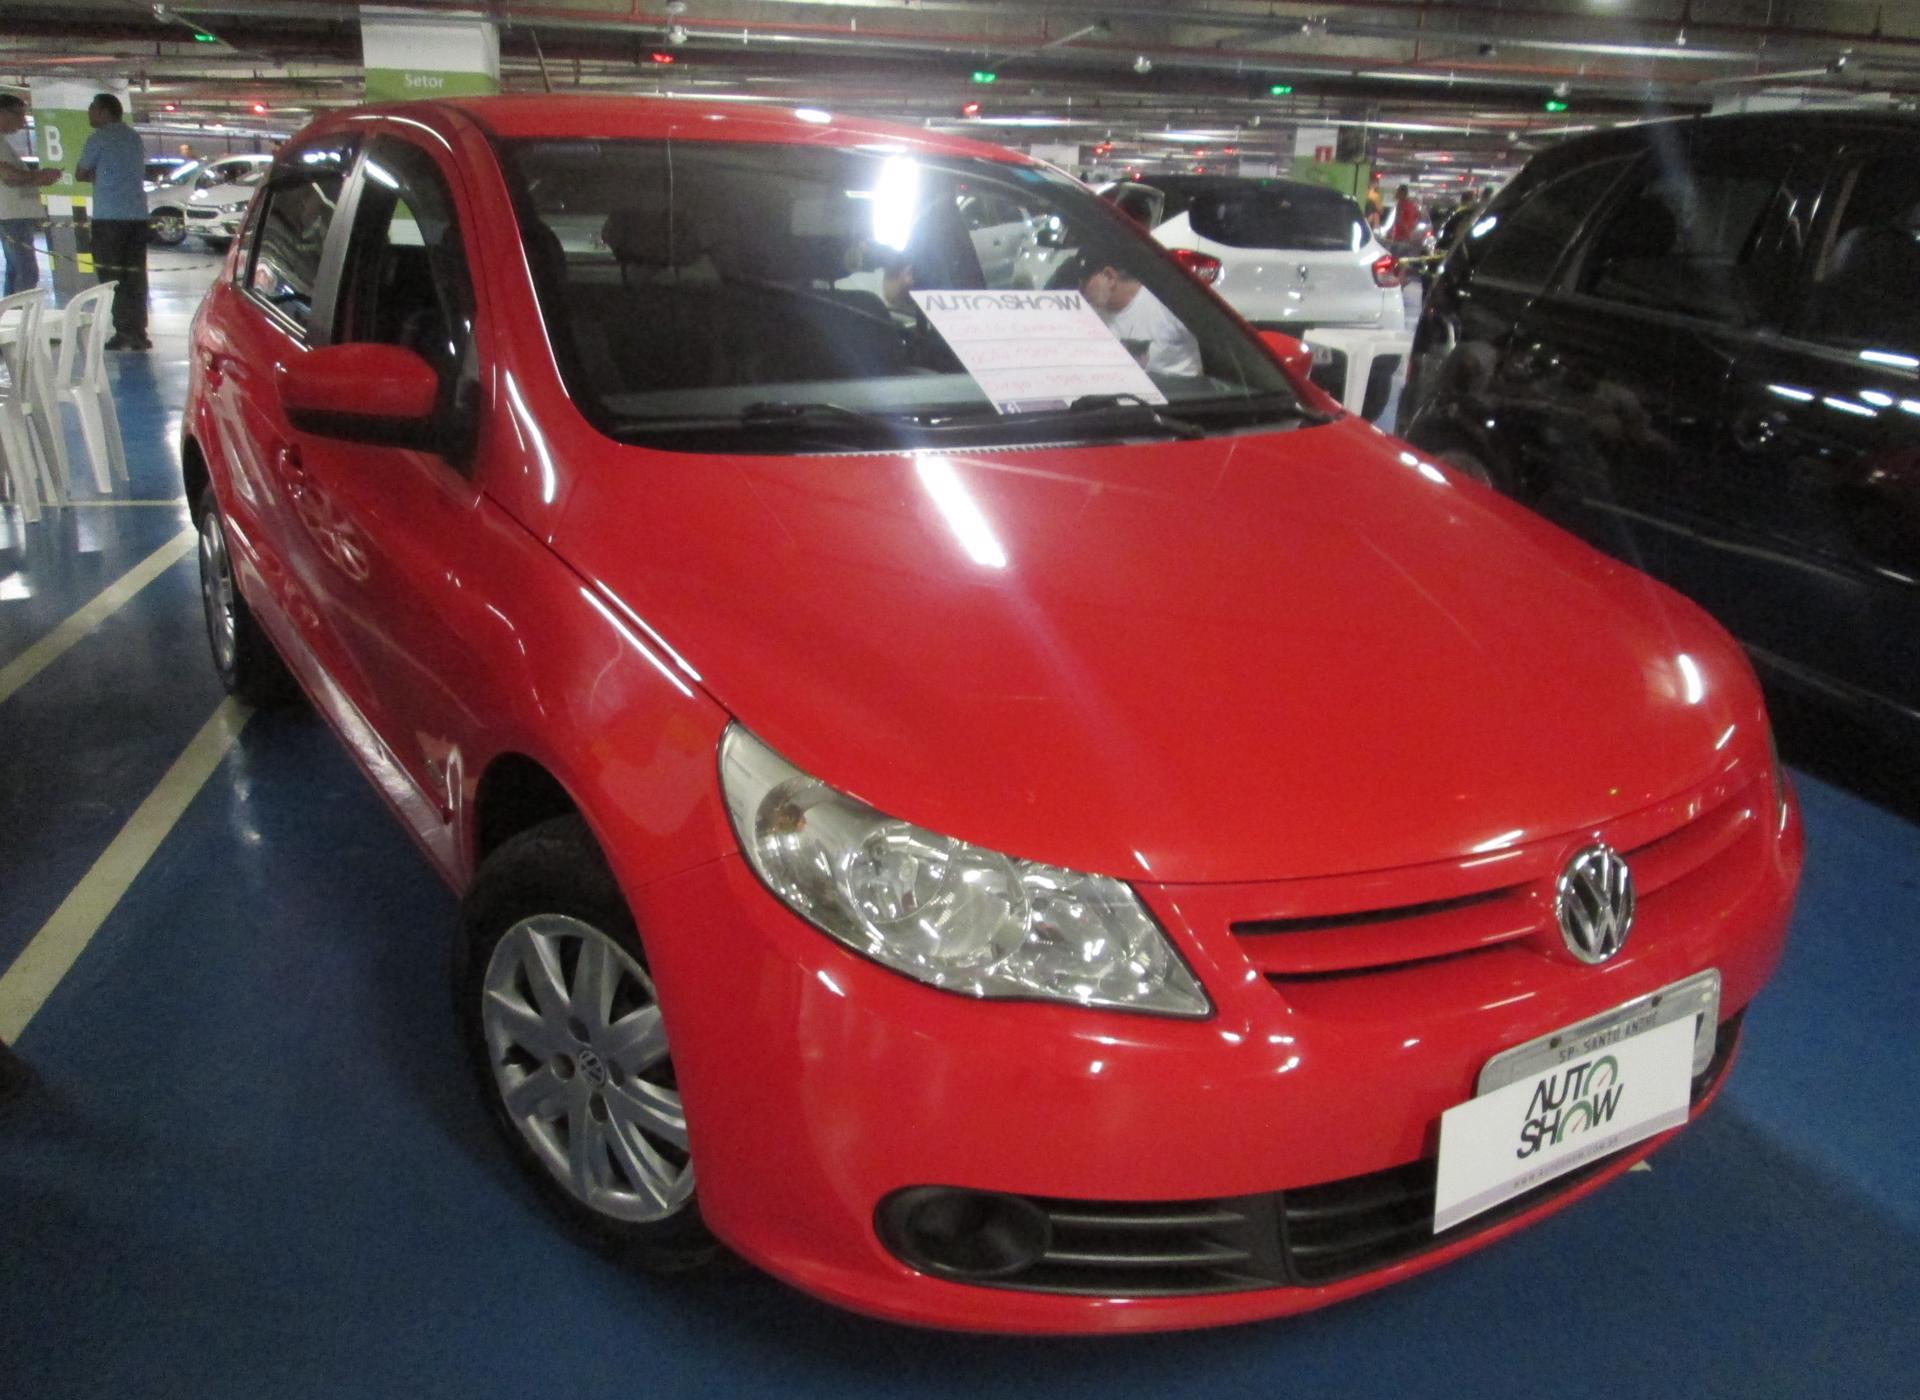 Feirão Auto Show Shopping ABC - VOLKSWAGEN GOL 1.6 I MOTI.POWER/HIGHLI T.FLEX 8V 4P 2012-2012